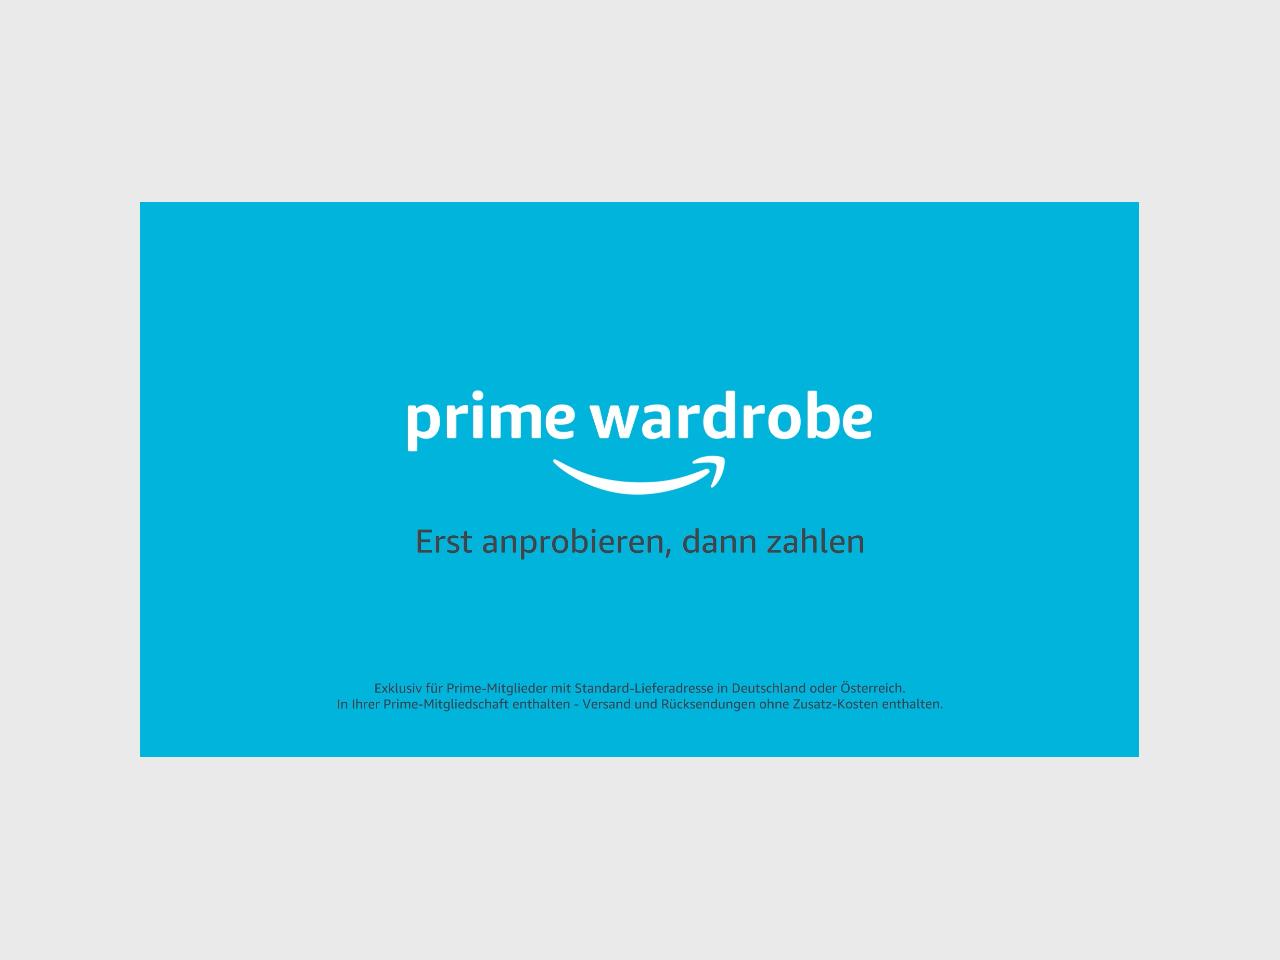 Wie funktioniert Amazon Prime Wardrobe?